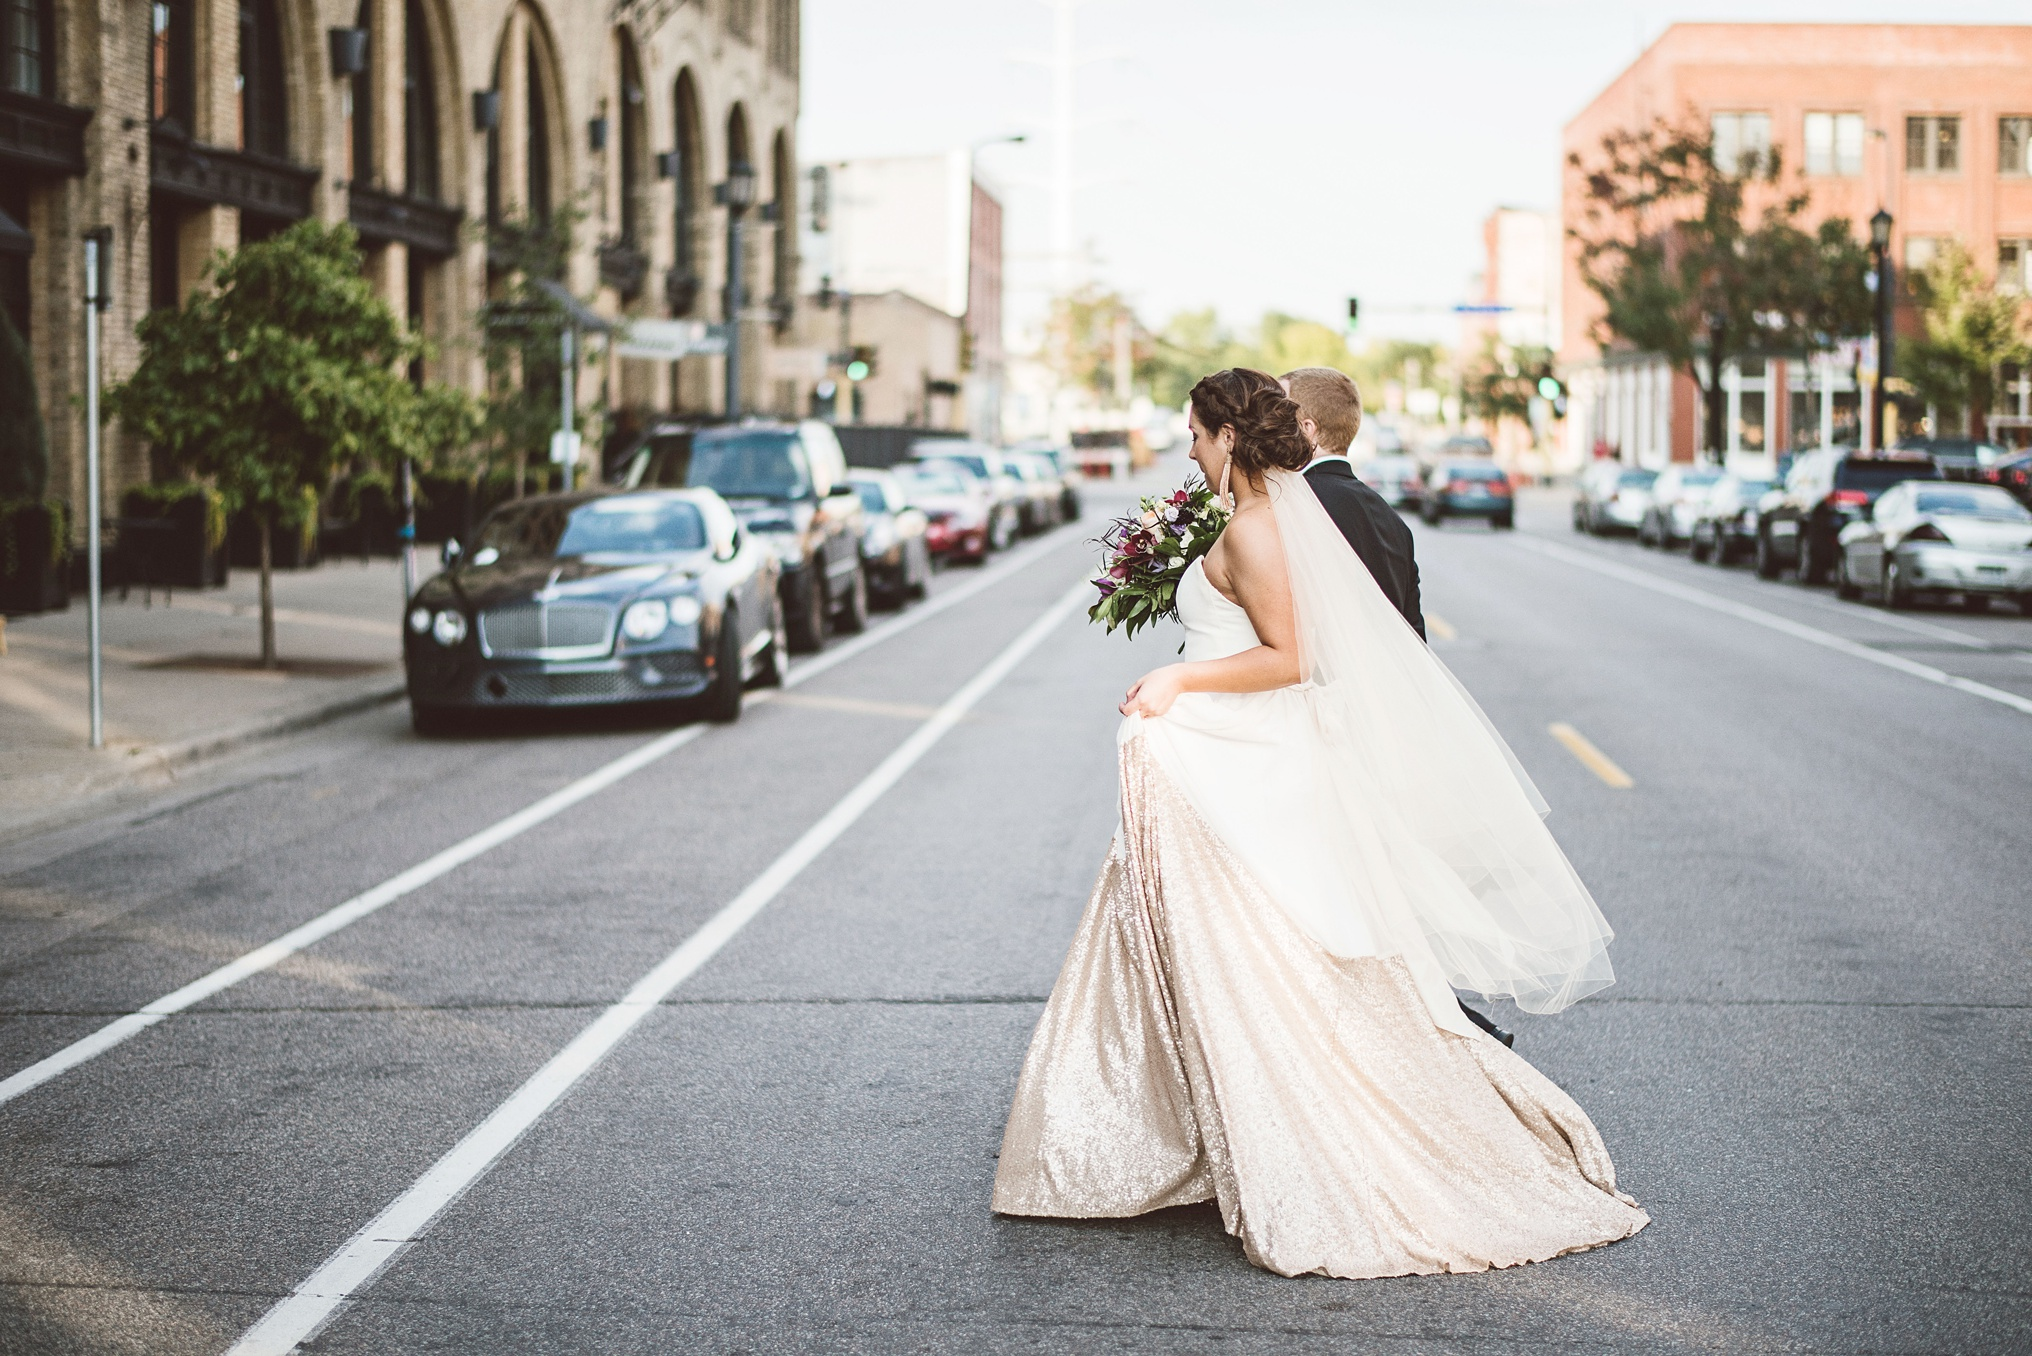 best_wedding_photography_2017_by_lucas_botz_photography_084.jpg